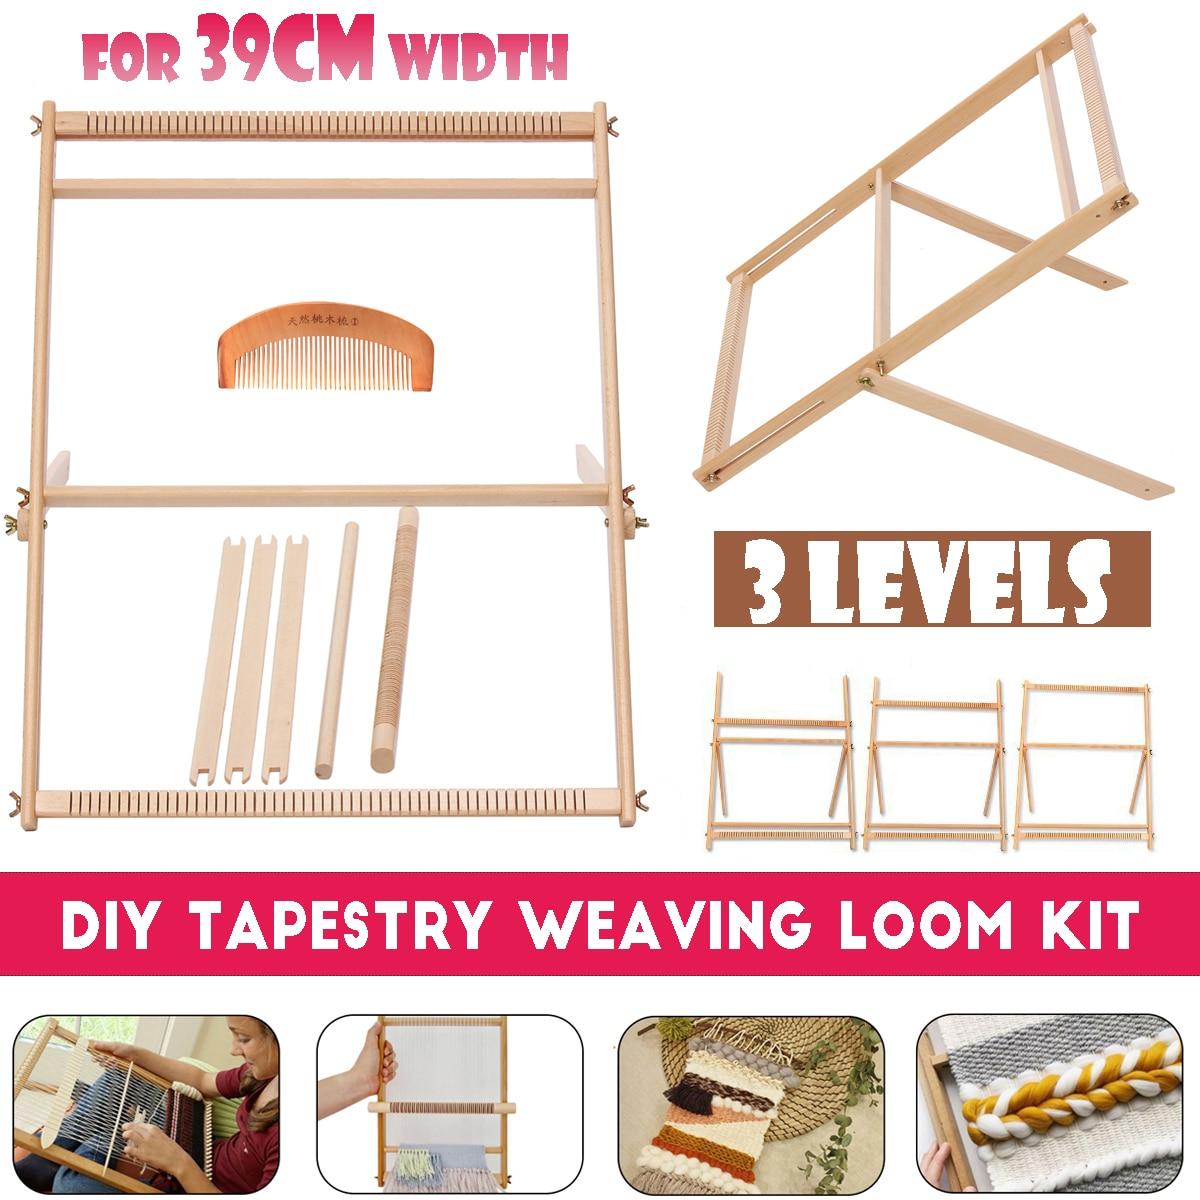 Wooden Weaving Loom Kit Hand-Woven DIY Woven Set Household Tapestry Scarf Multifunctional Loom Sewing Machine